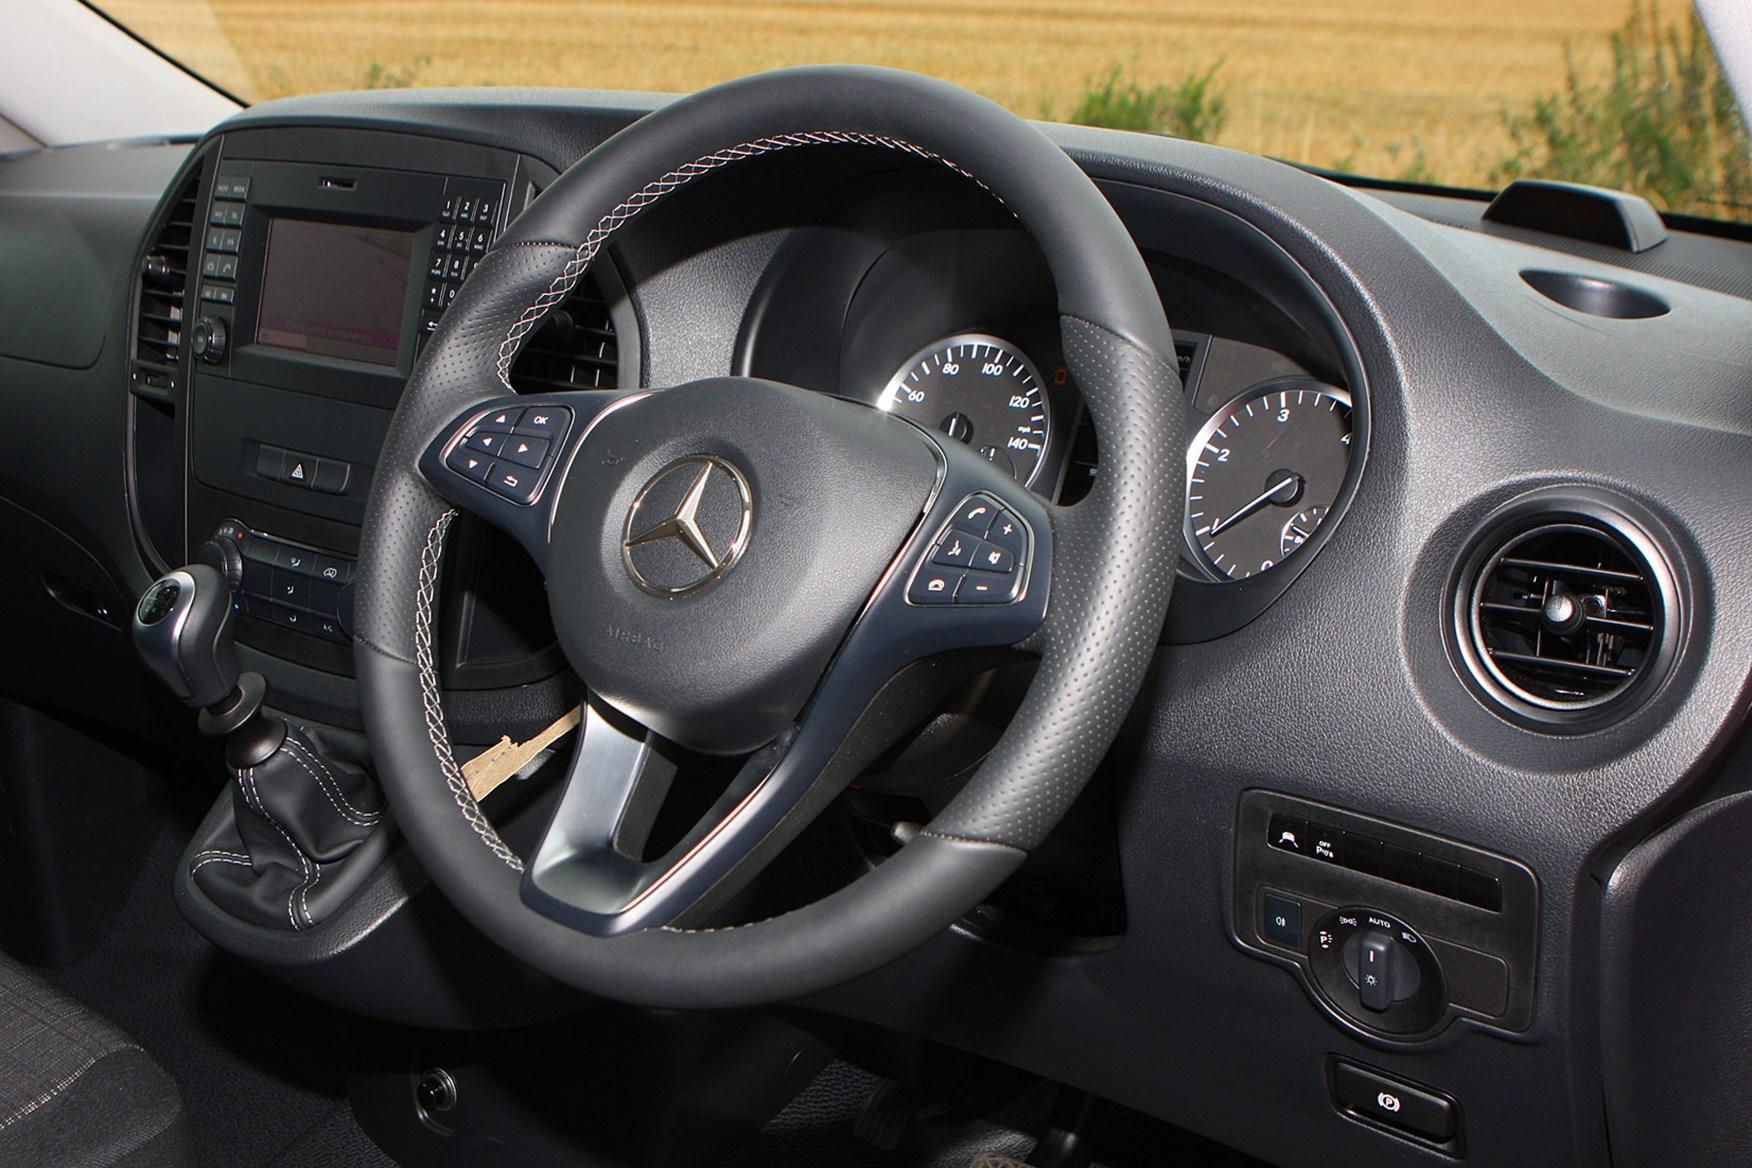 Mercedes-Benz Vito 111CDi Long review - cab interior, steering wheel, dashboard